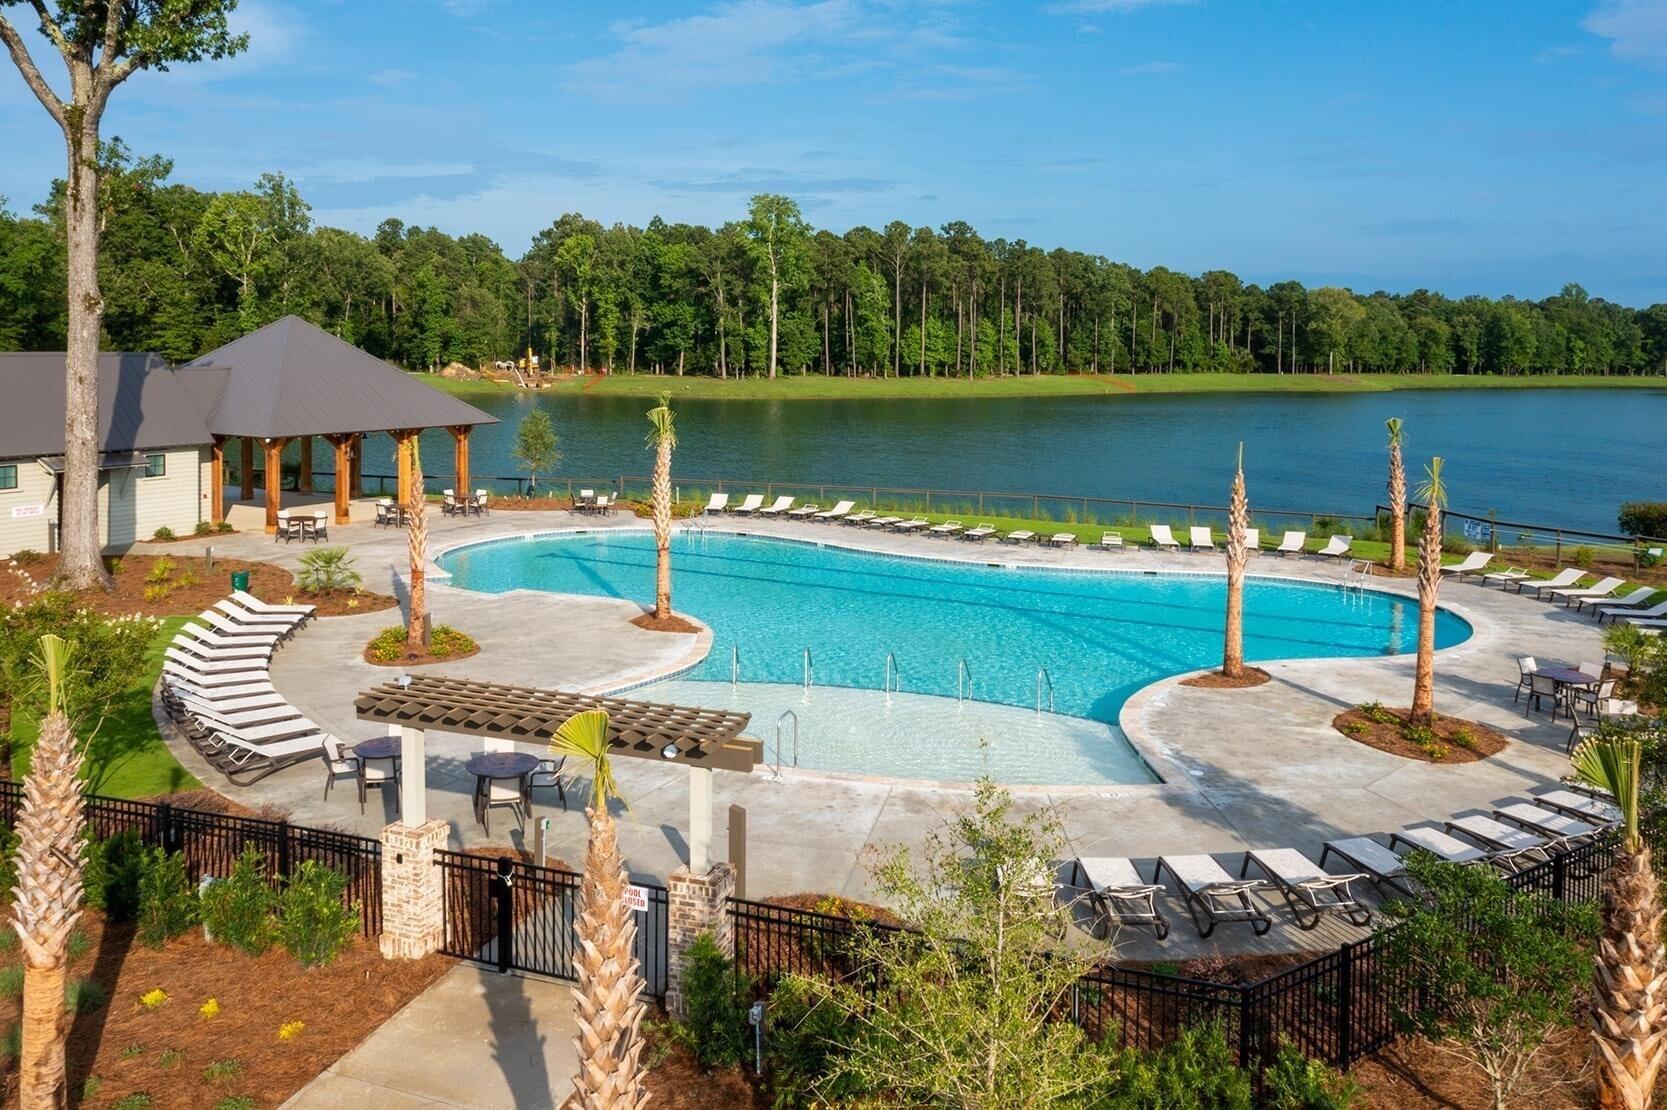 Carolina Park Homes For Sale - 3890 Sawyers Island, Mount Pleasant, SC - 4